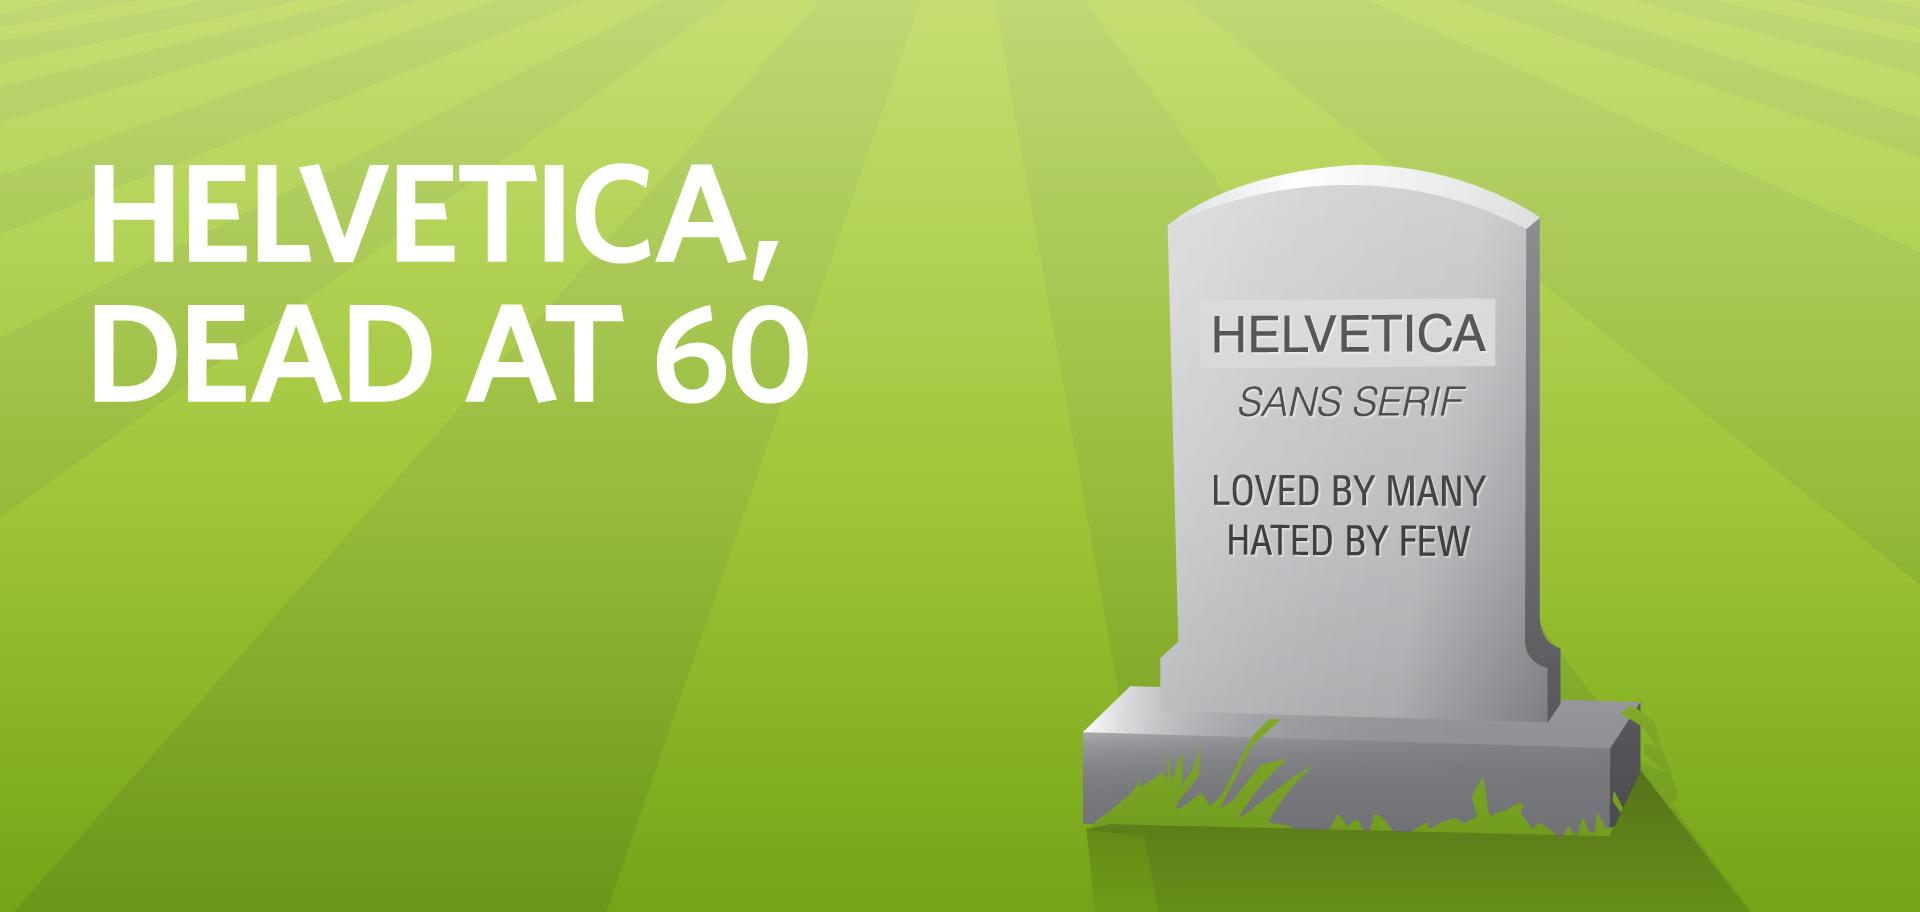 Kettle Fire Creative Helvetica Dead at 60 history font typeface helvetica Helvetica, Dead at 60 helvetica fi